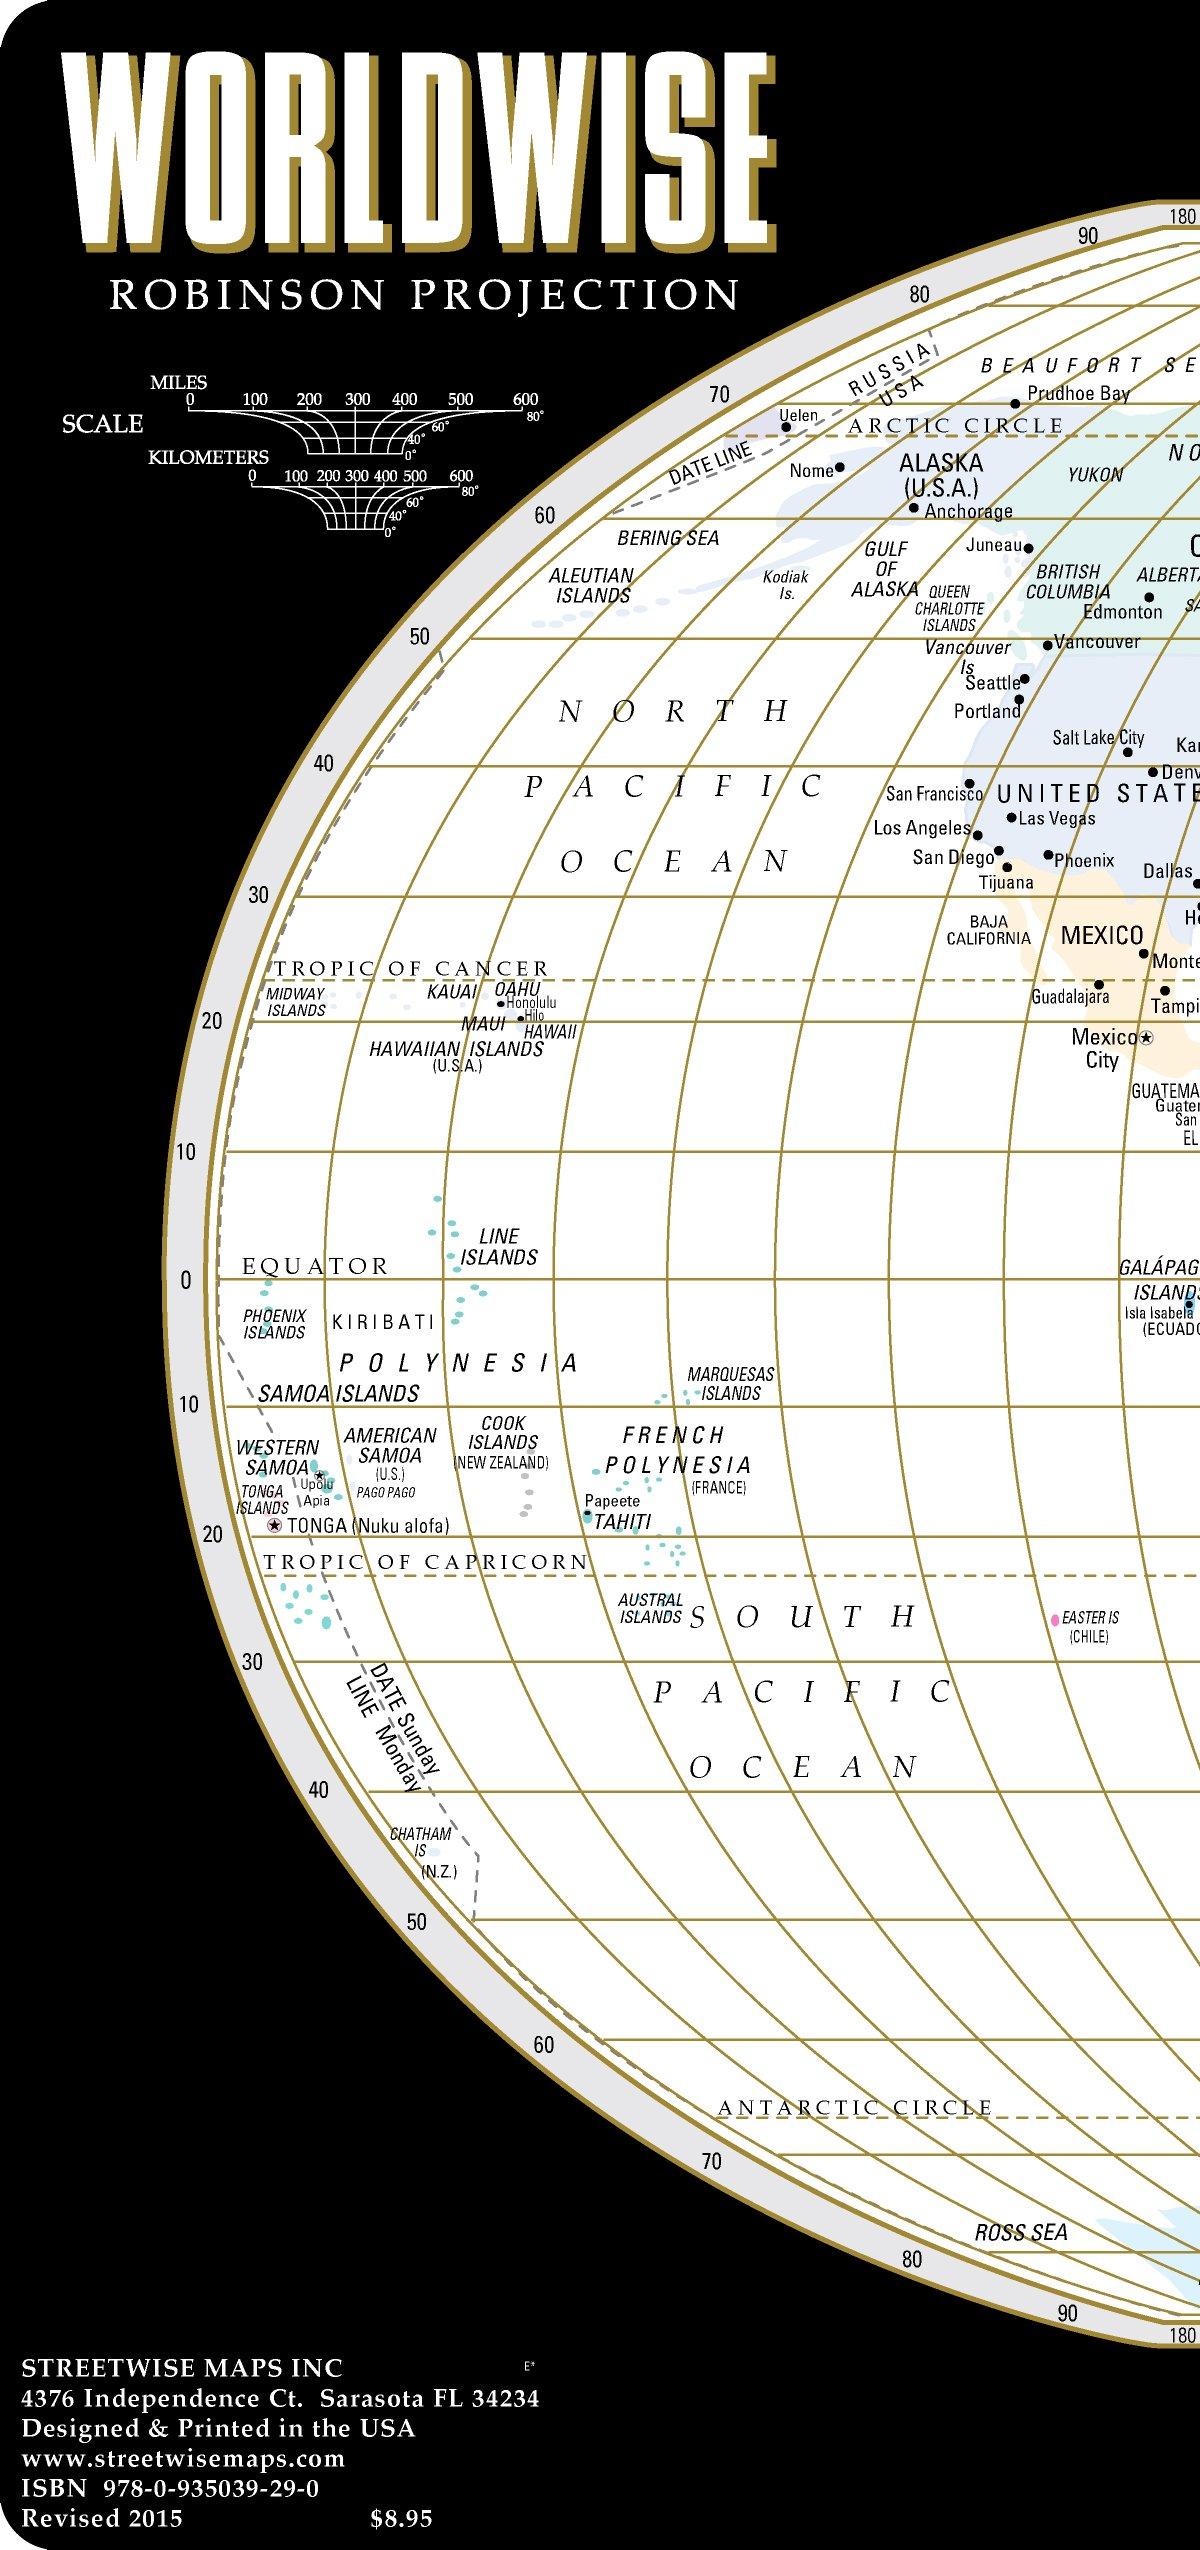 Laminated World map: Streetwise World Map - Laminated Time Zone Map of the World - WORLDWISE